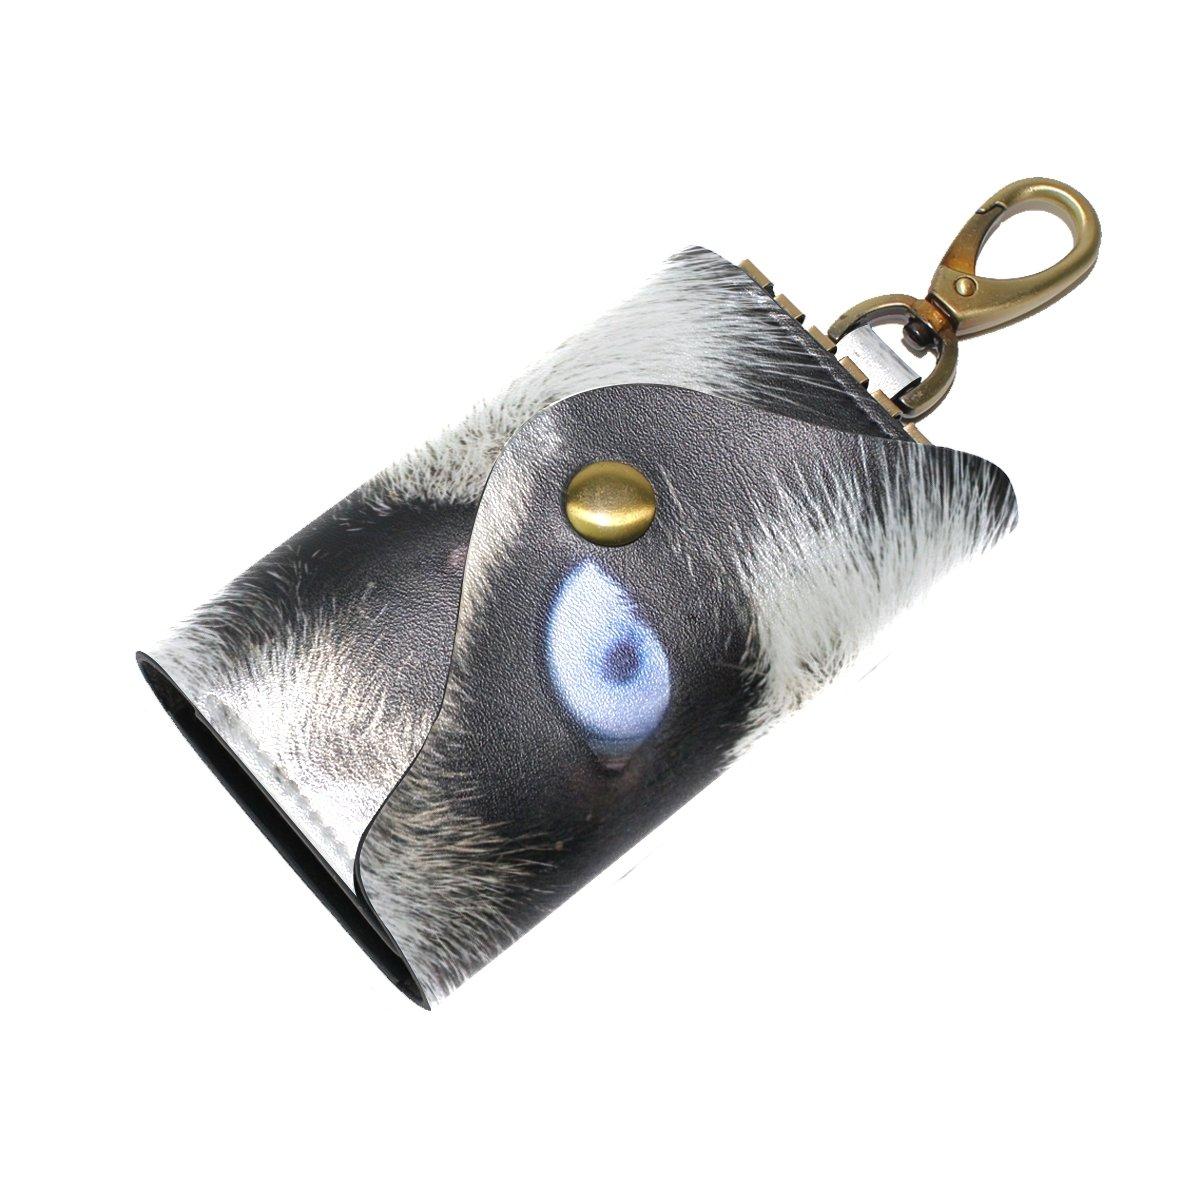 KEAKIA Blue Wolf Eyes Leather Key Case Wallets Tri-fold Key Holder Keychains with 6 Hooks 2 Slot Snap Closure for Men Women